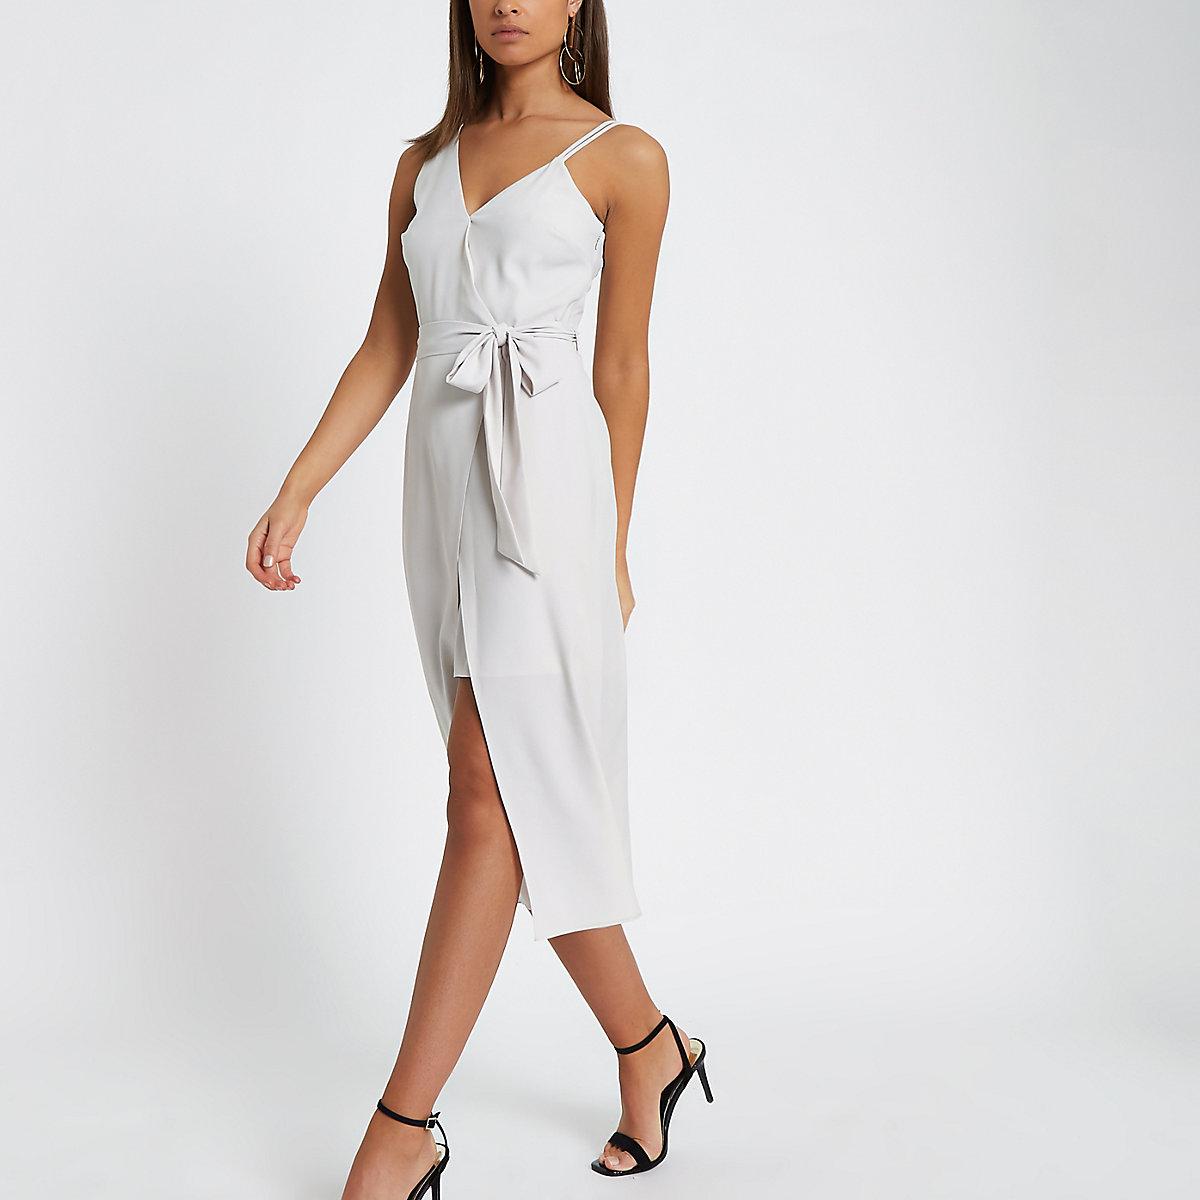 Grey one shoulder midi dress